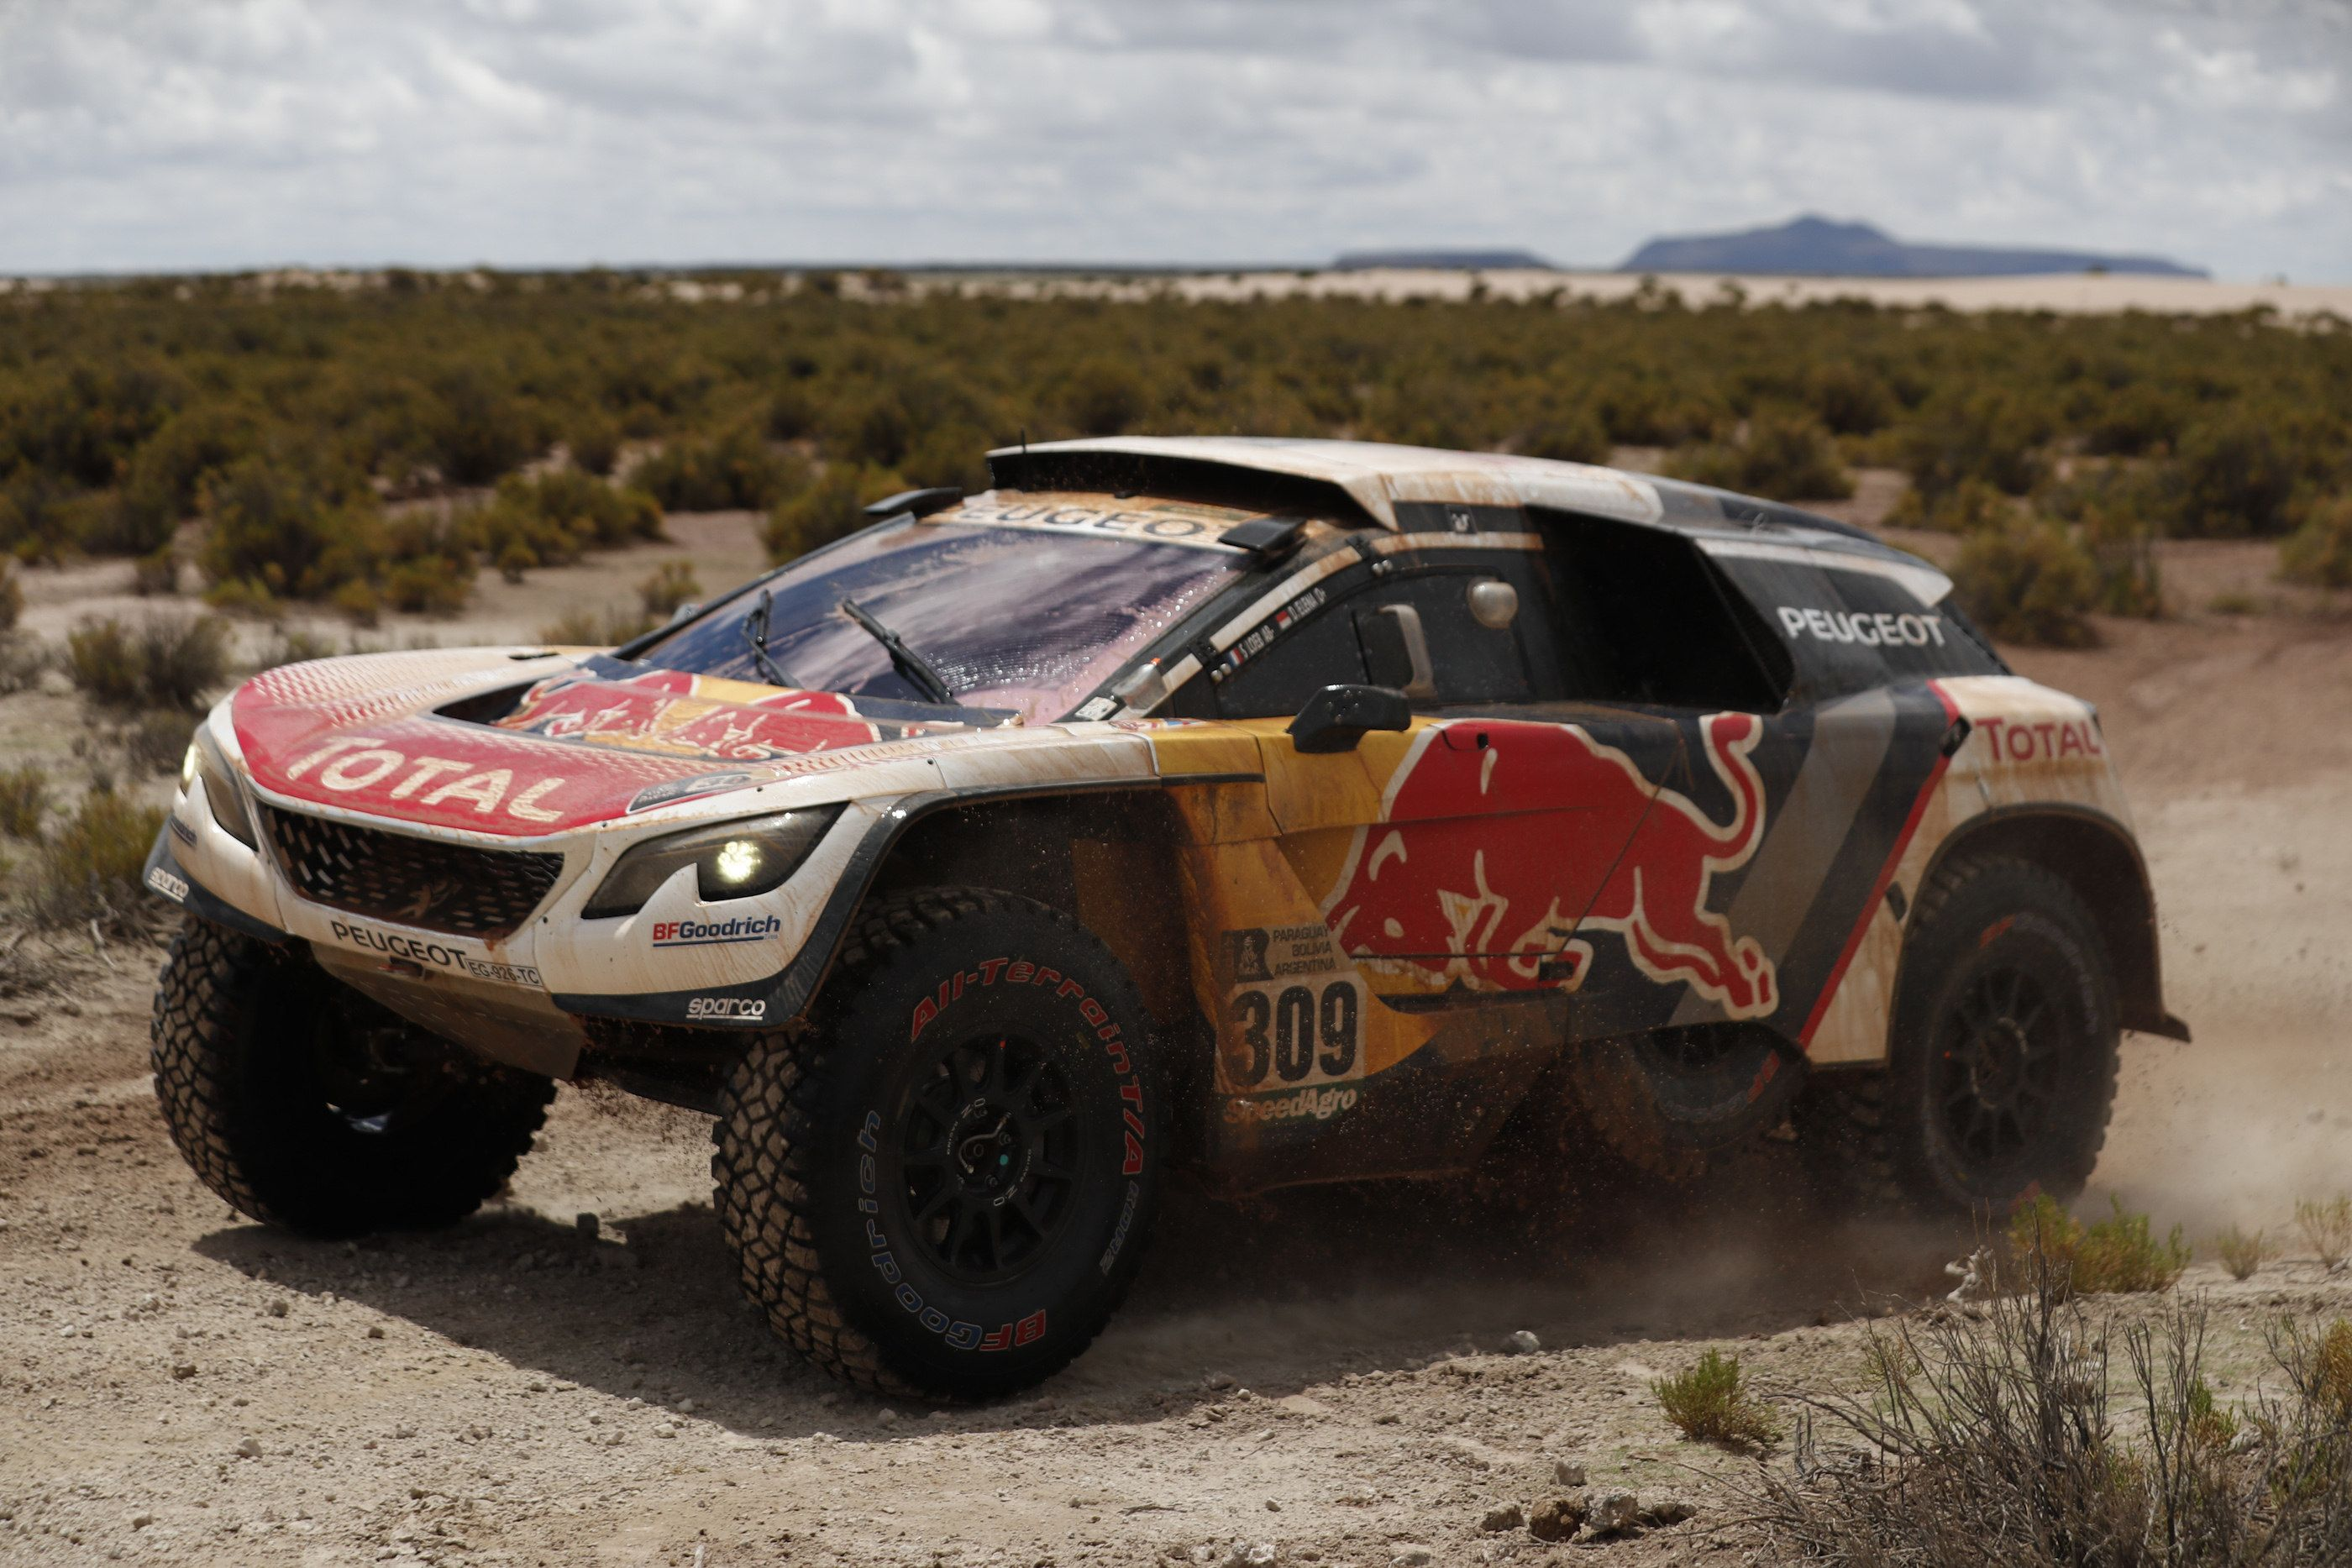 Dakar 2017: Peterhansel ganó la séptima etapa de autos y sigue como líder